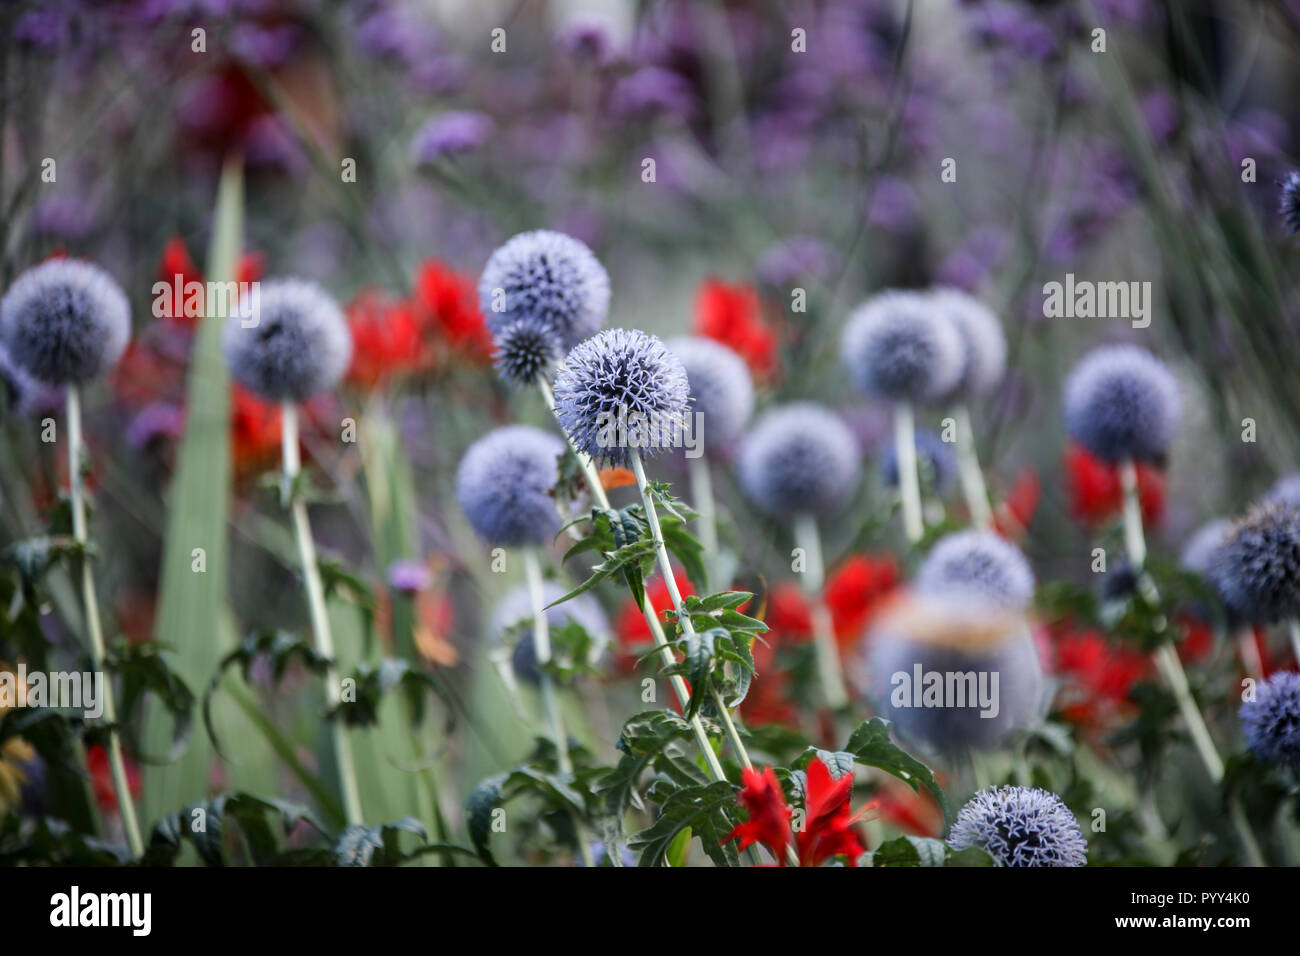 Tall Blue Flower Spikes Stock Photos Tall Blue Flower Spikes Stock